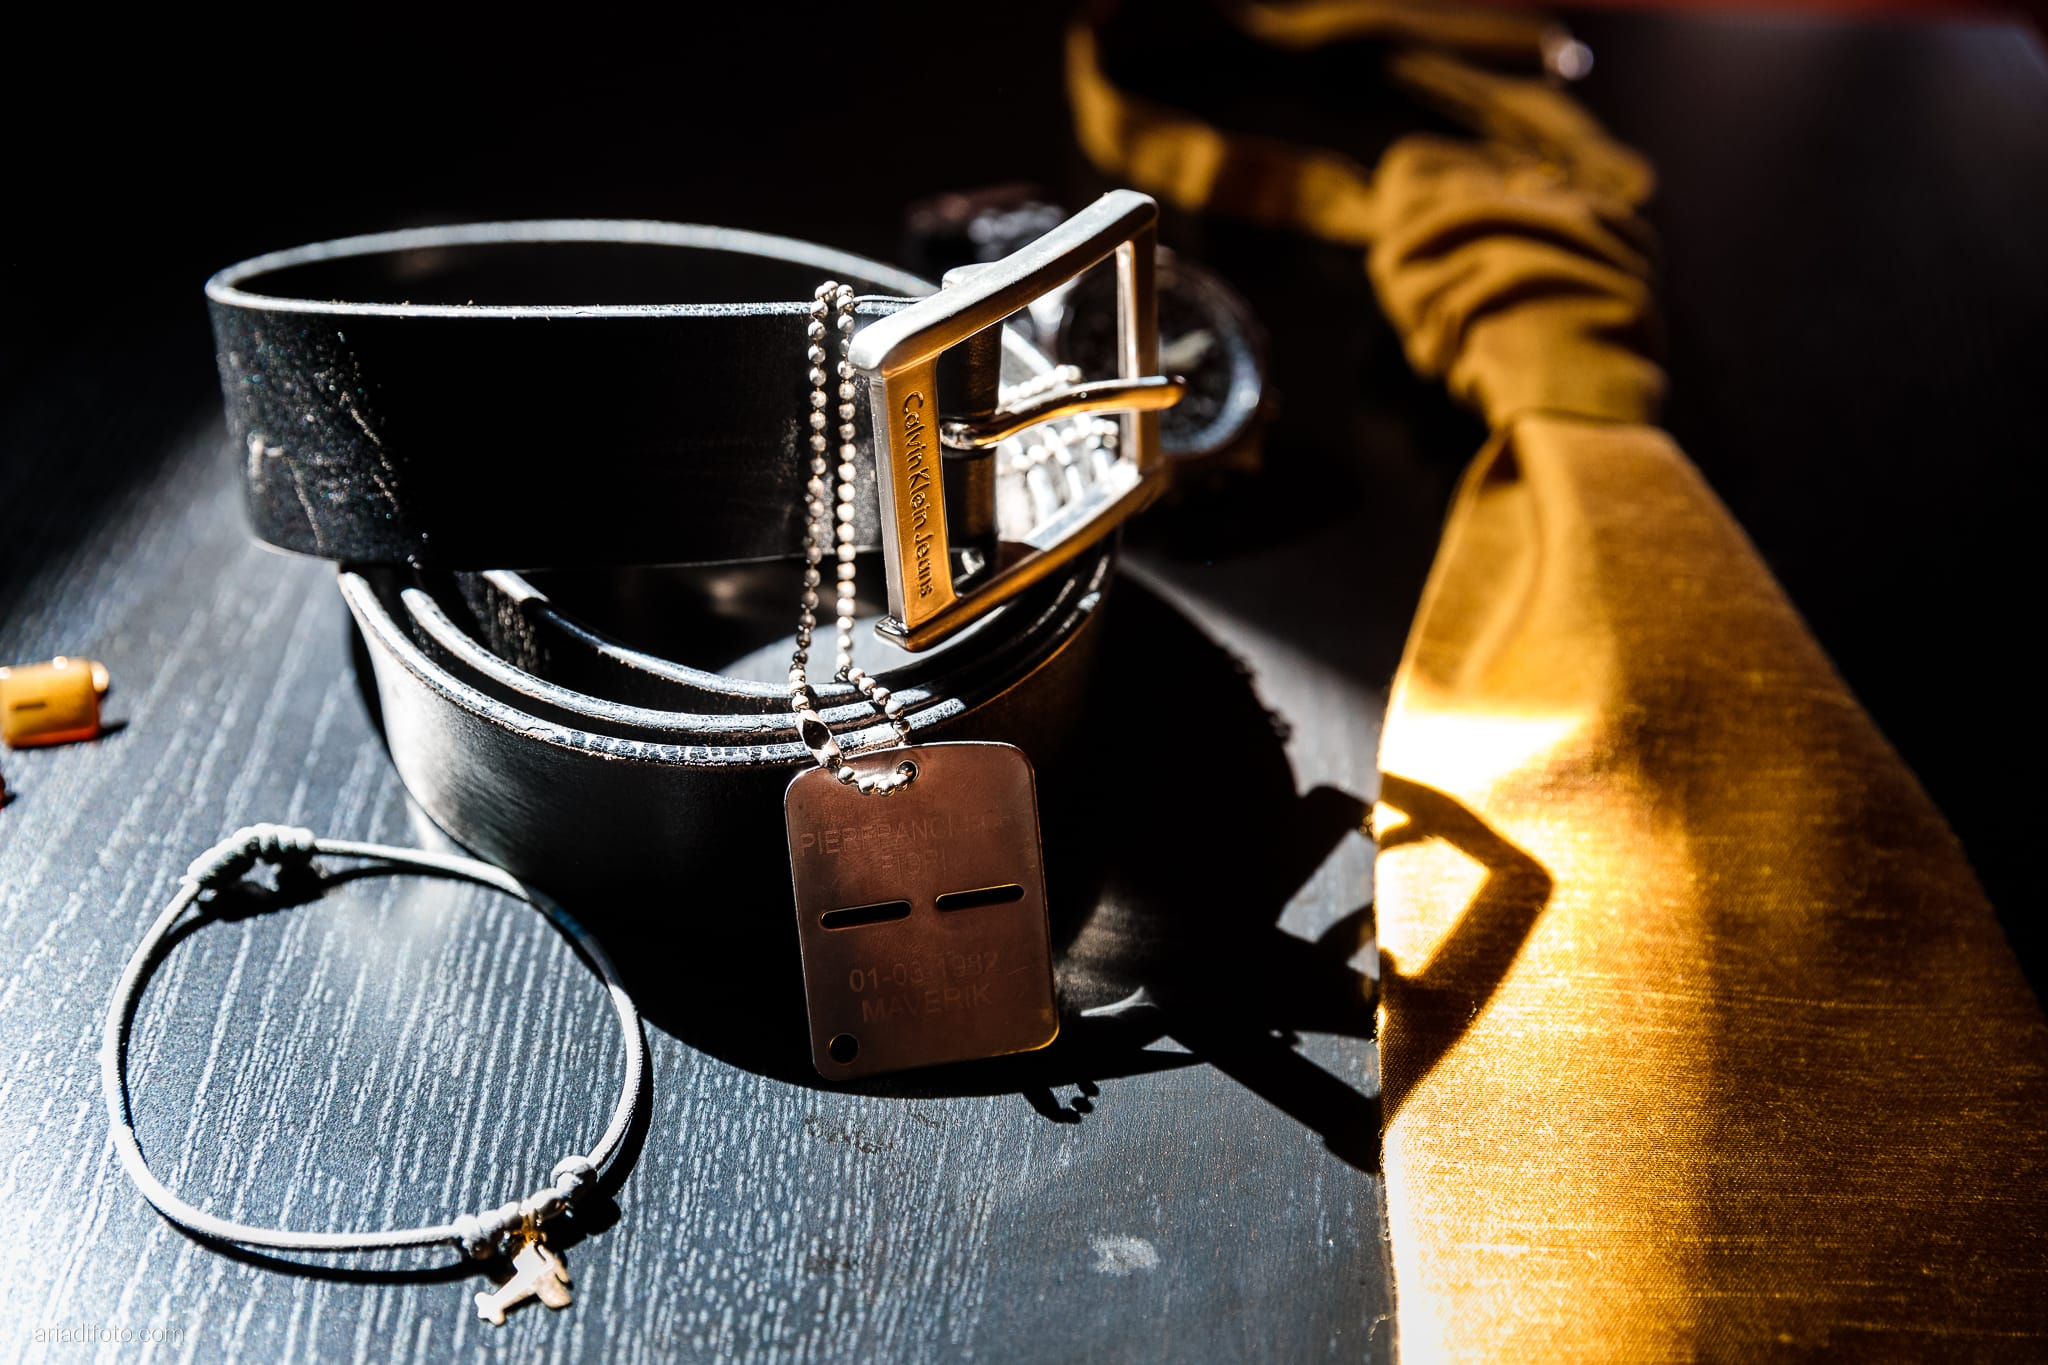 Nicoletta Pierfrancesco Matrimonio Gorizia Villa Attems Lucinico preparativi sposo dettagli cravatta cintura bracciale gemelli piastrina militare areonautica maverik